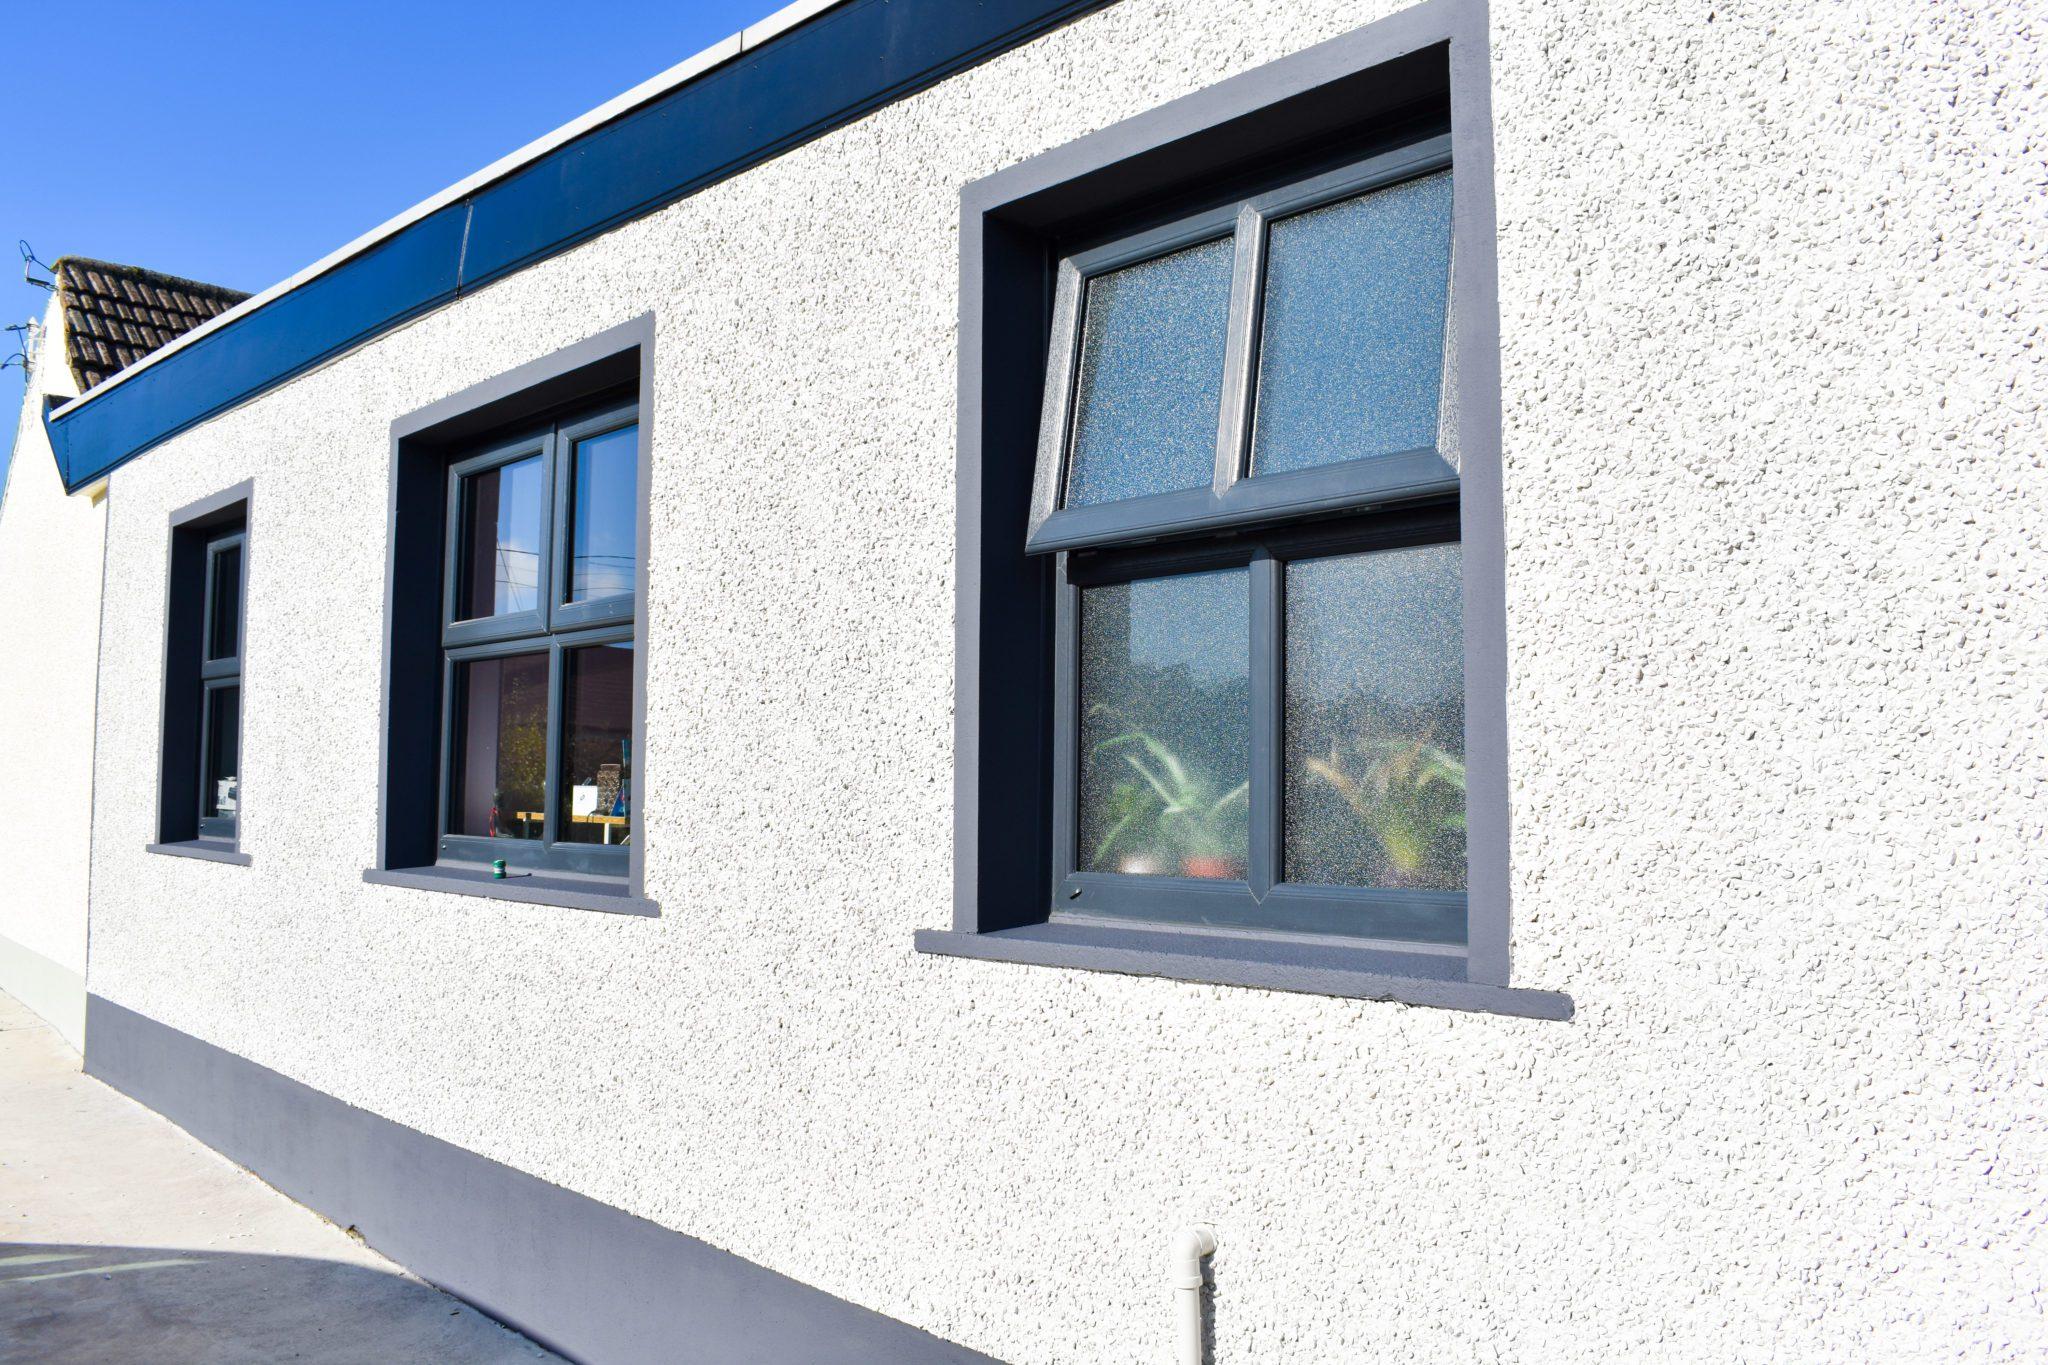 Grey uPVC casement windows